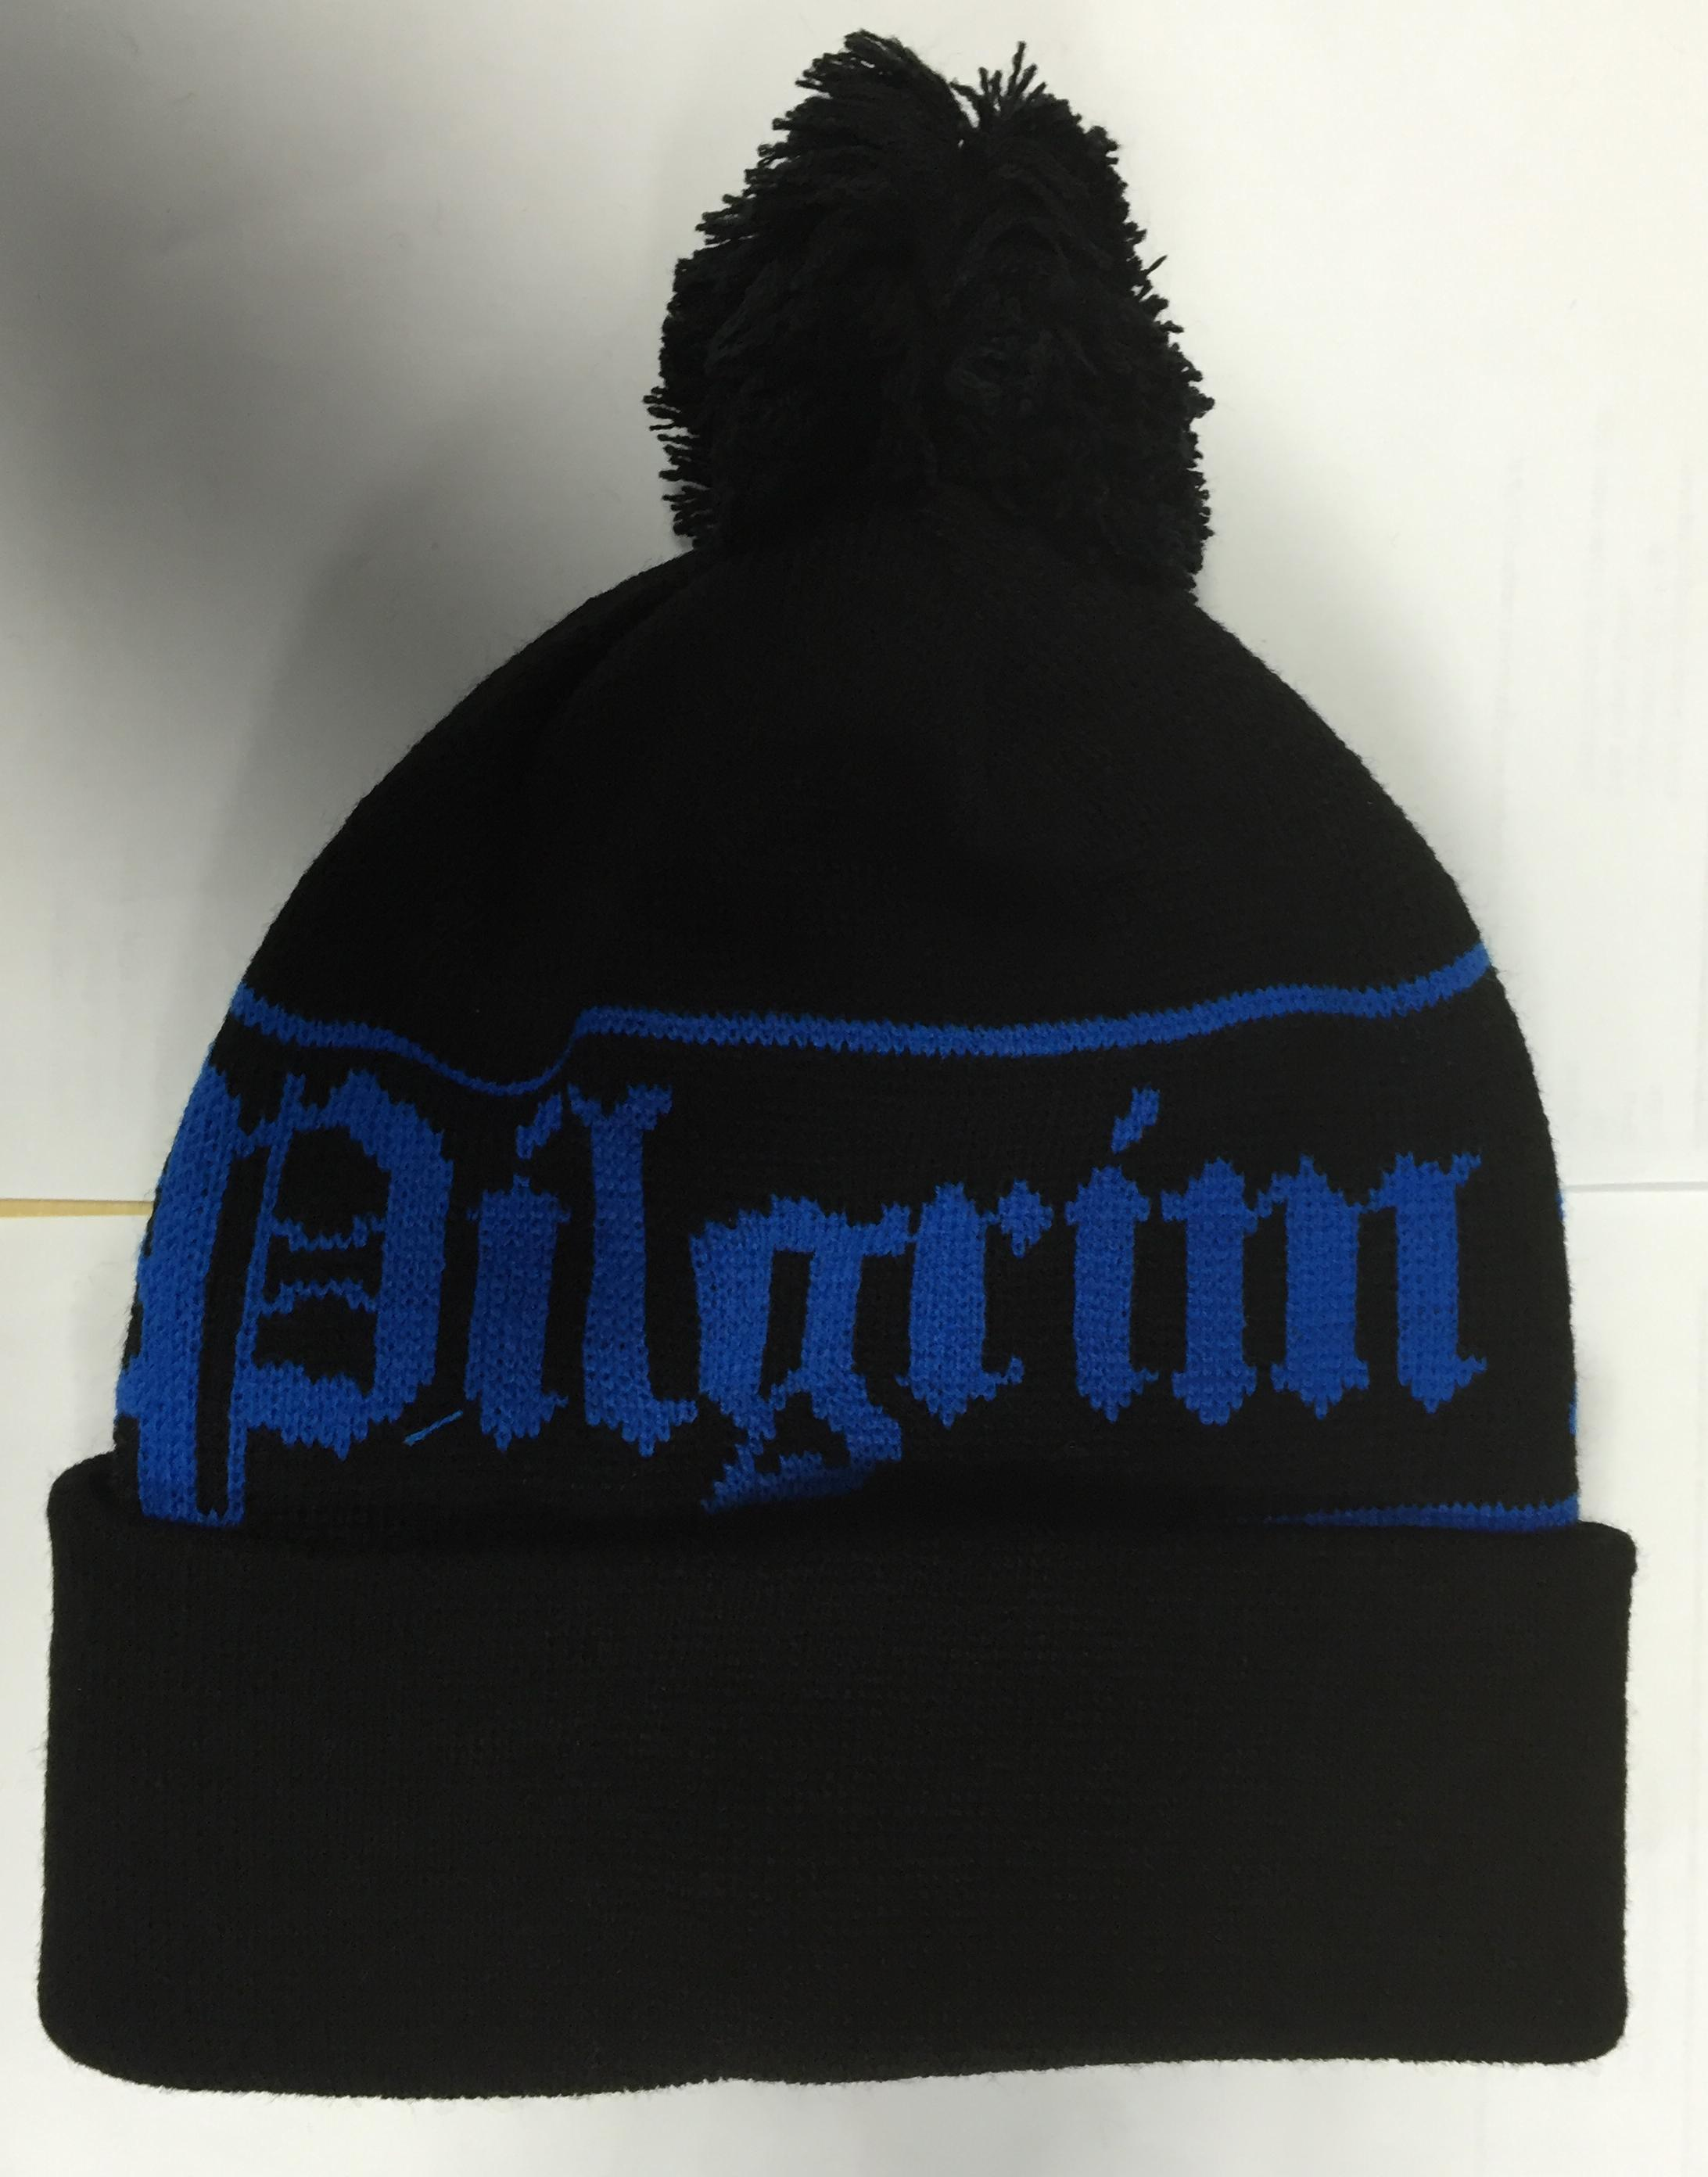 Pilgrim jacquard beanies 028